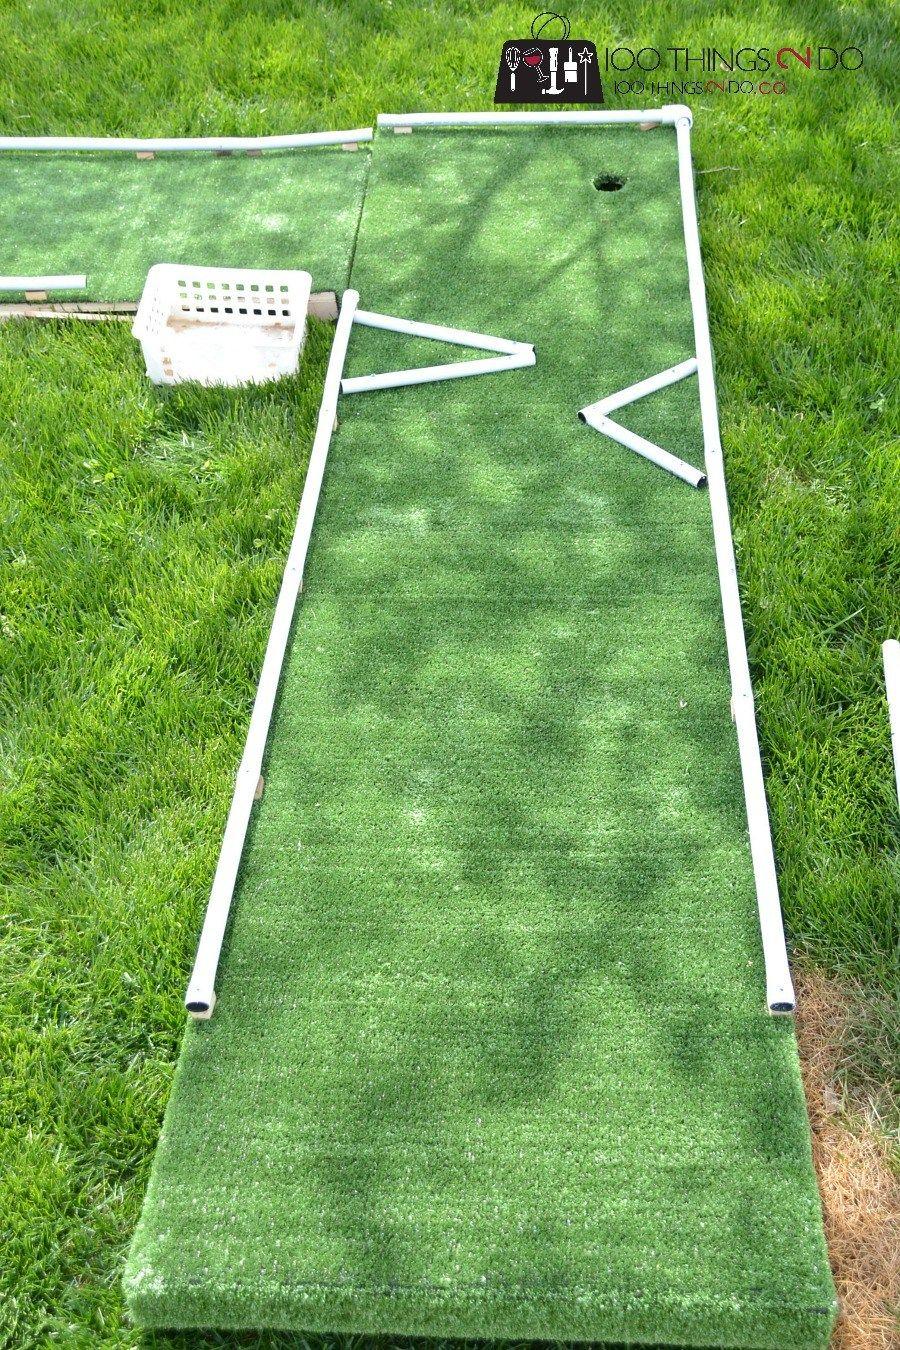 Diy Mini Golf Mini Golf Mini Putt Diy Mini Putt Backyard Games Backyard Fun Diy Backyard Games Golf Diy Mini Putt Backyard Putting Green Mini golf in my backyard